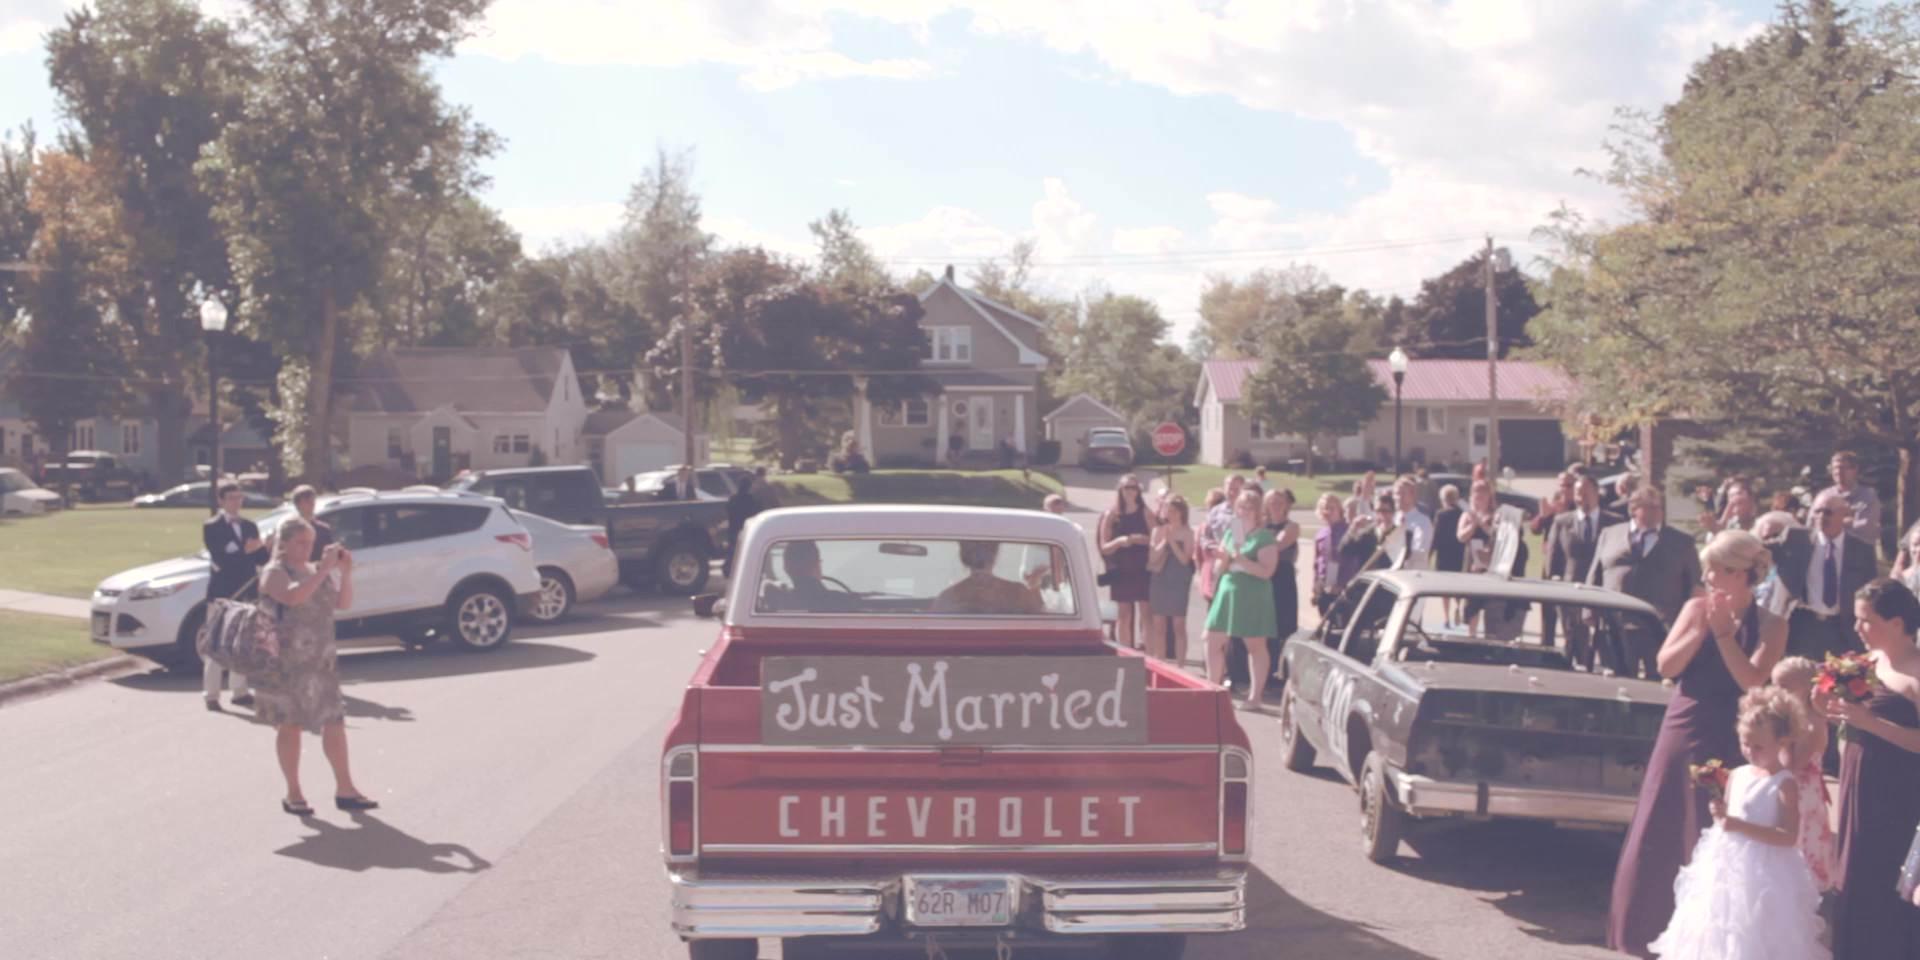 eric&lindsey wedding story.mp4-still00008.jpg